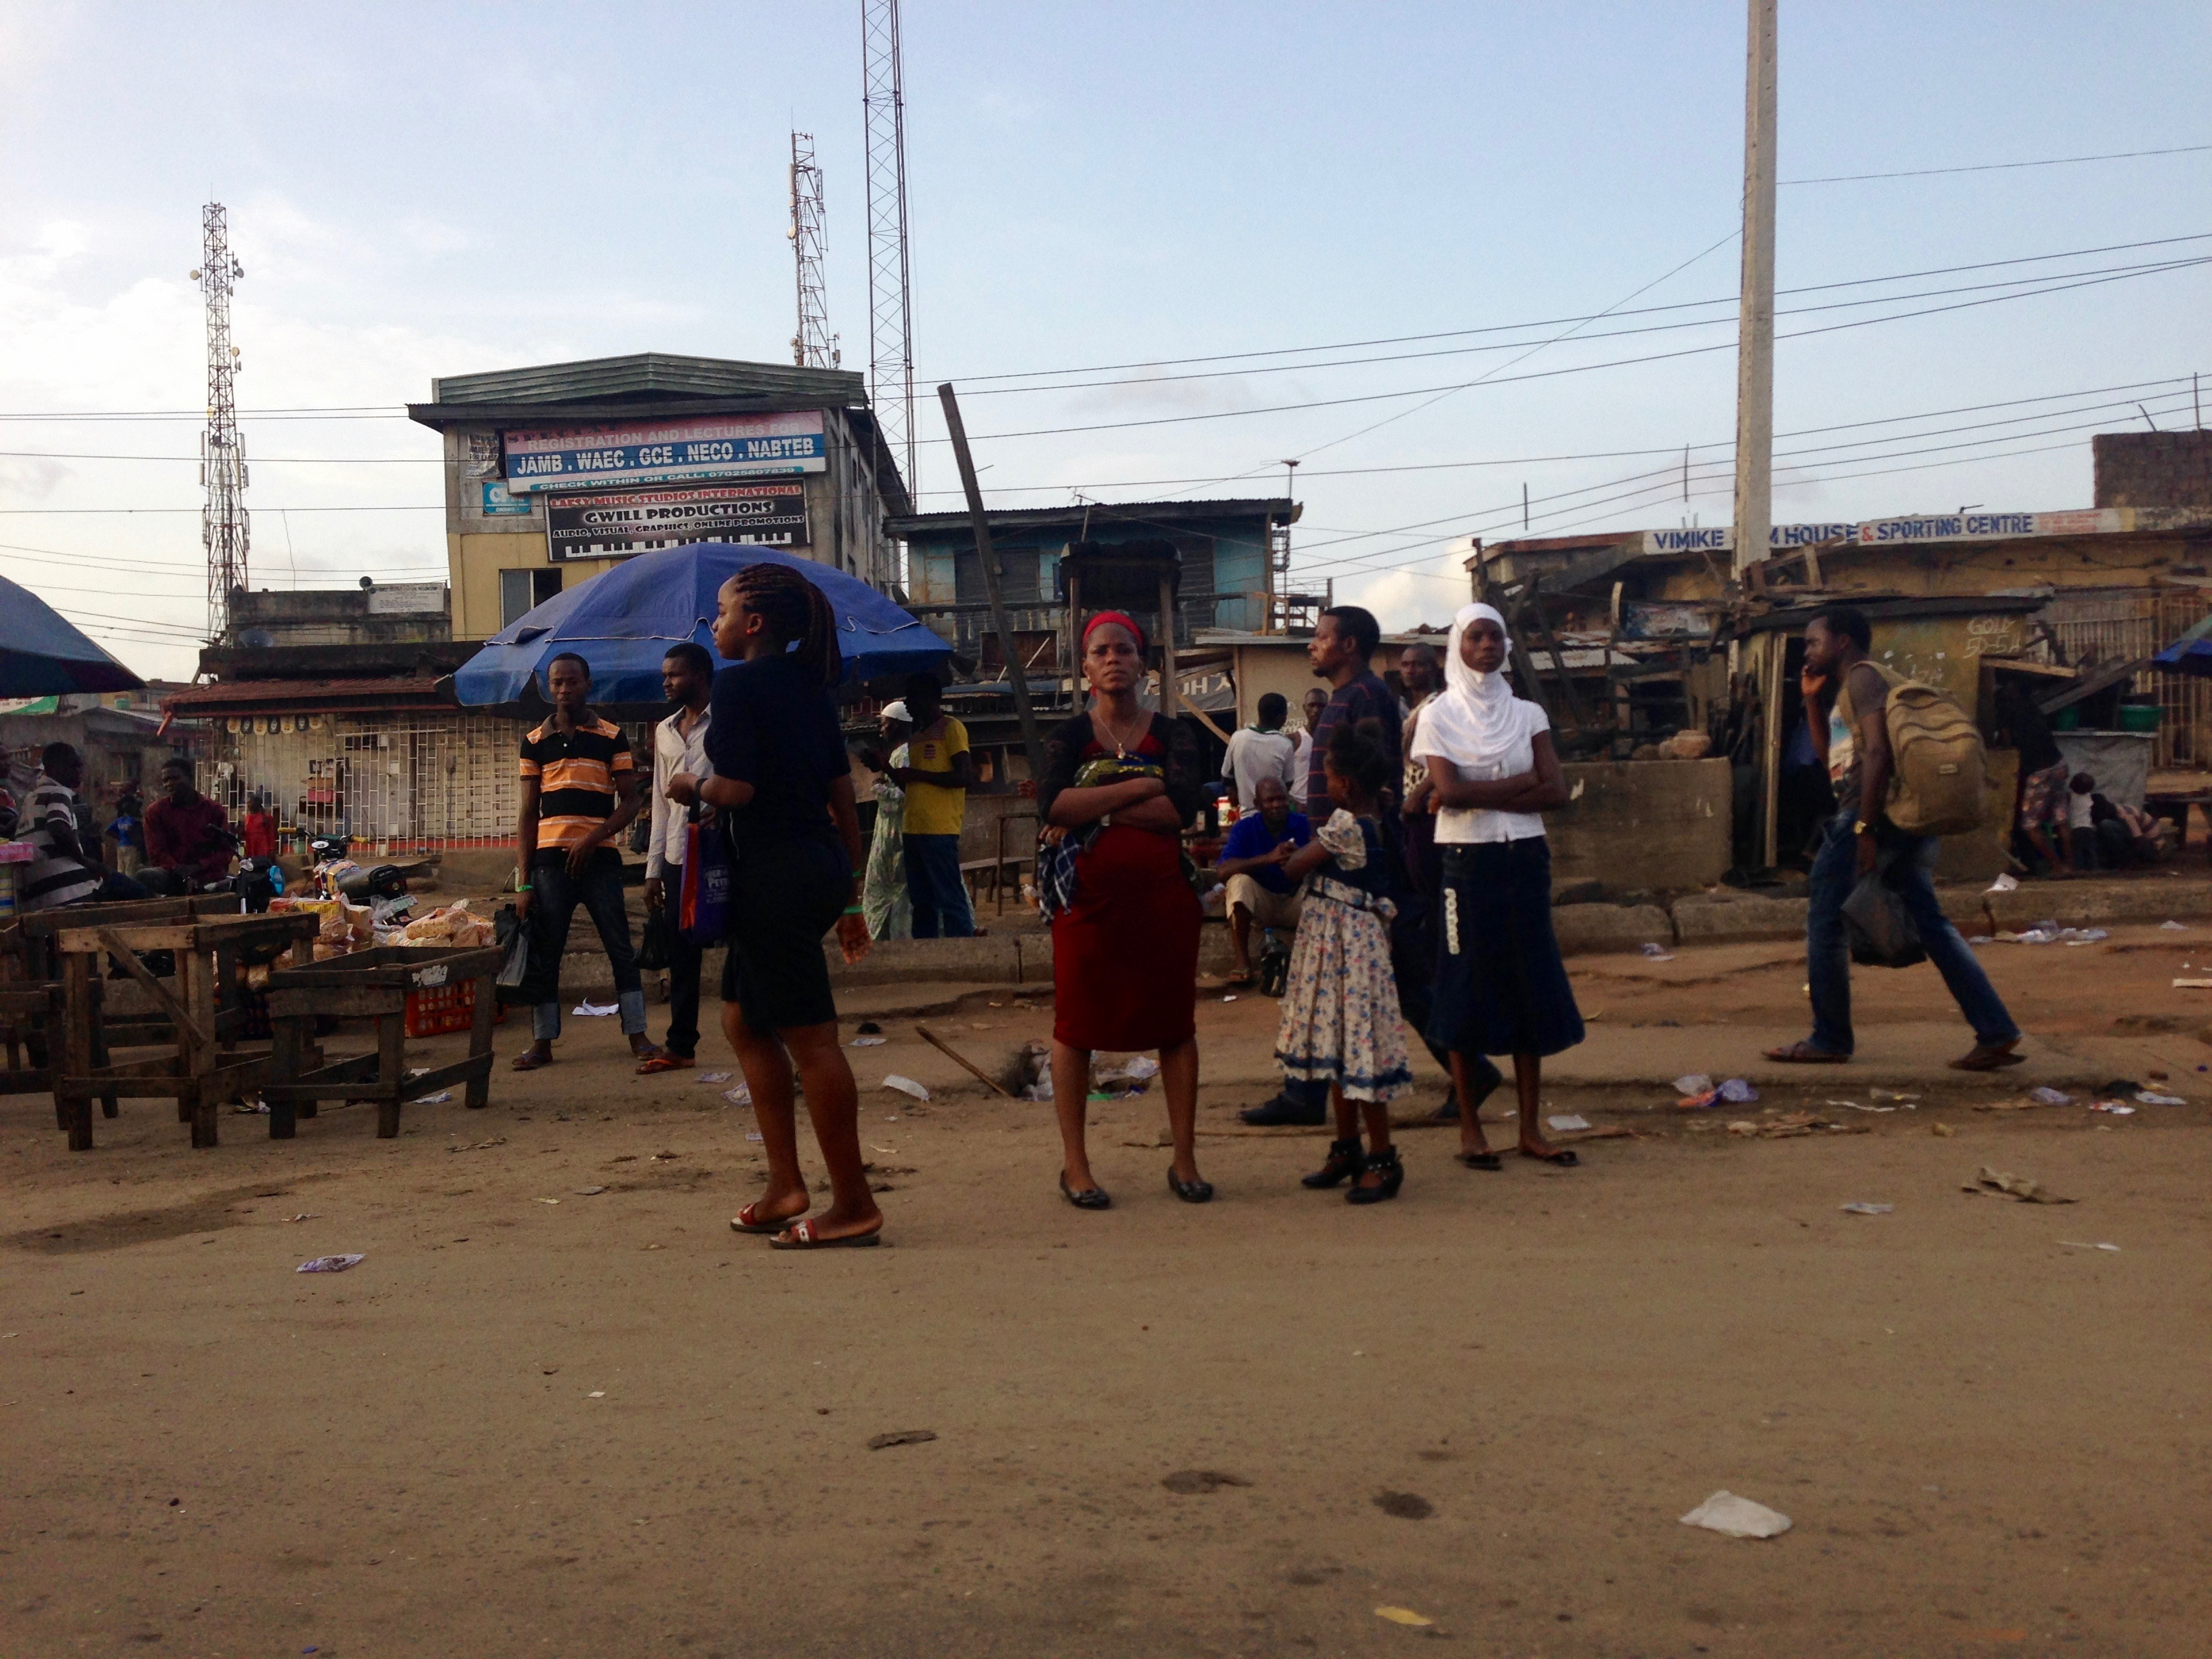 Street scene in Lagos, Nigeria. #JujuFilms